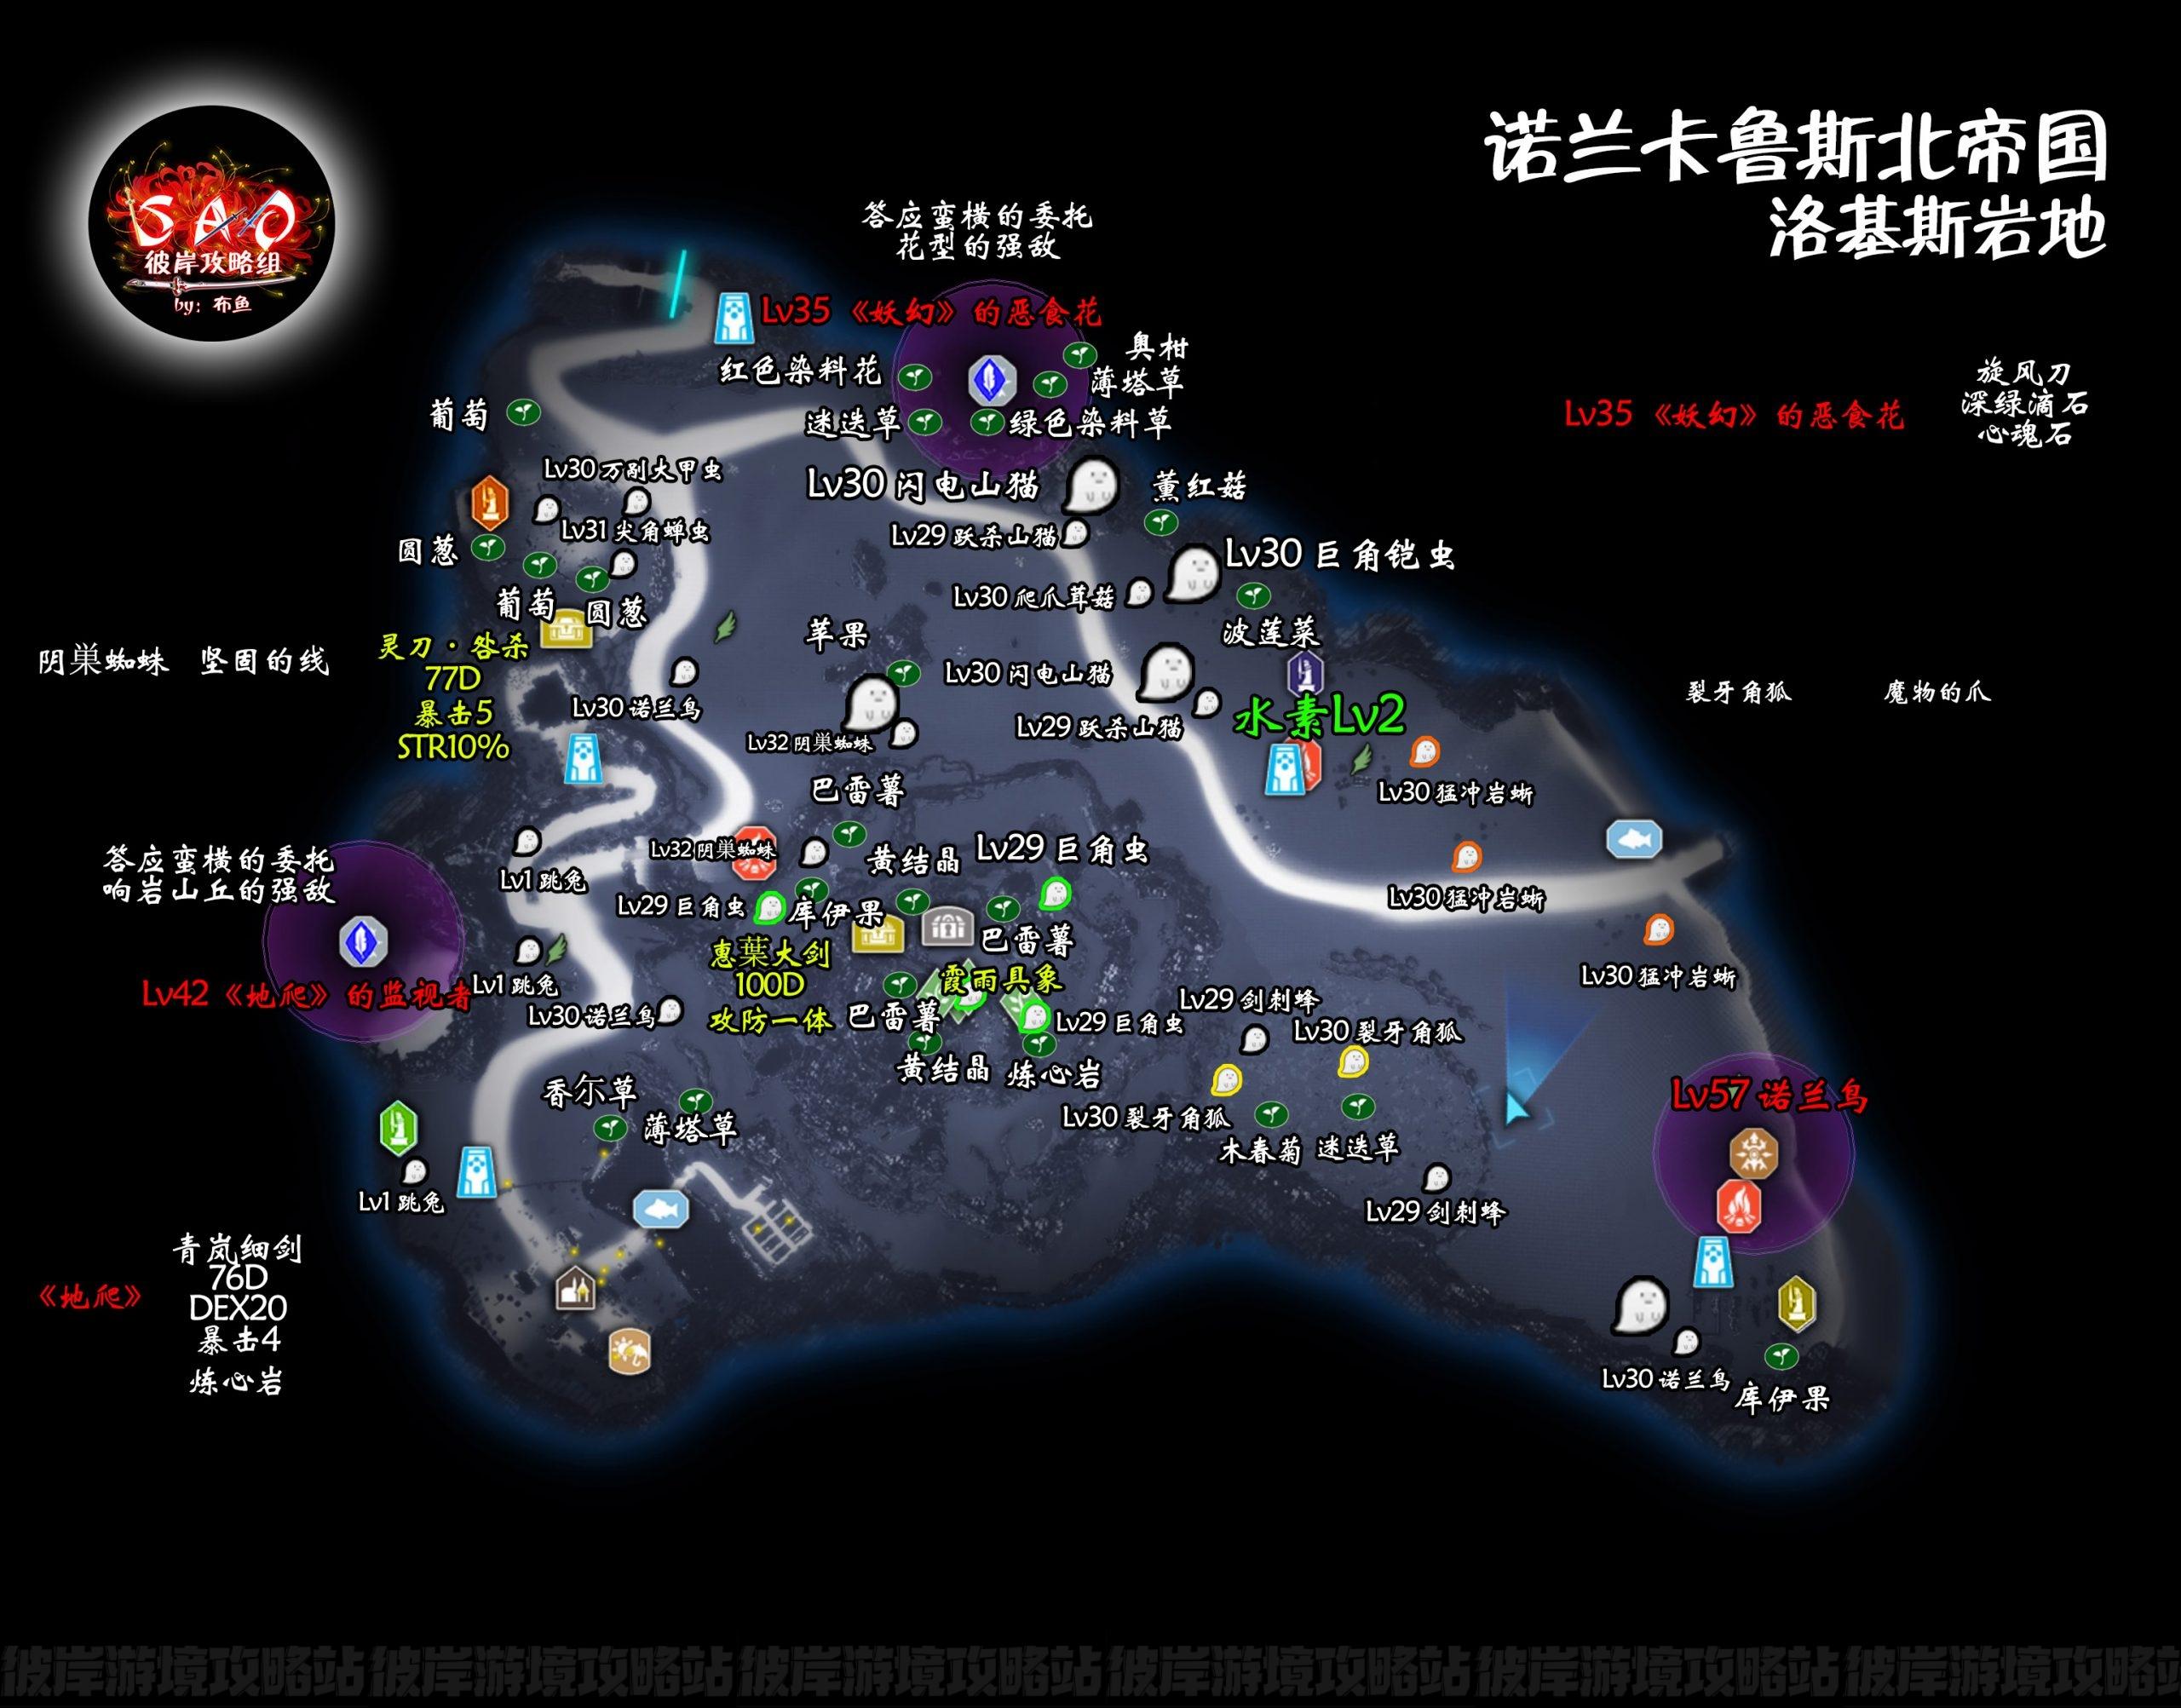 【SAOAL攻略组】超完全流程地图攻略及新手指引-洛基斯岩地篇-刀剑神域彼岸游境攻略站